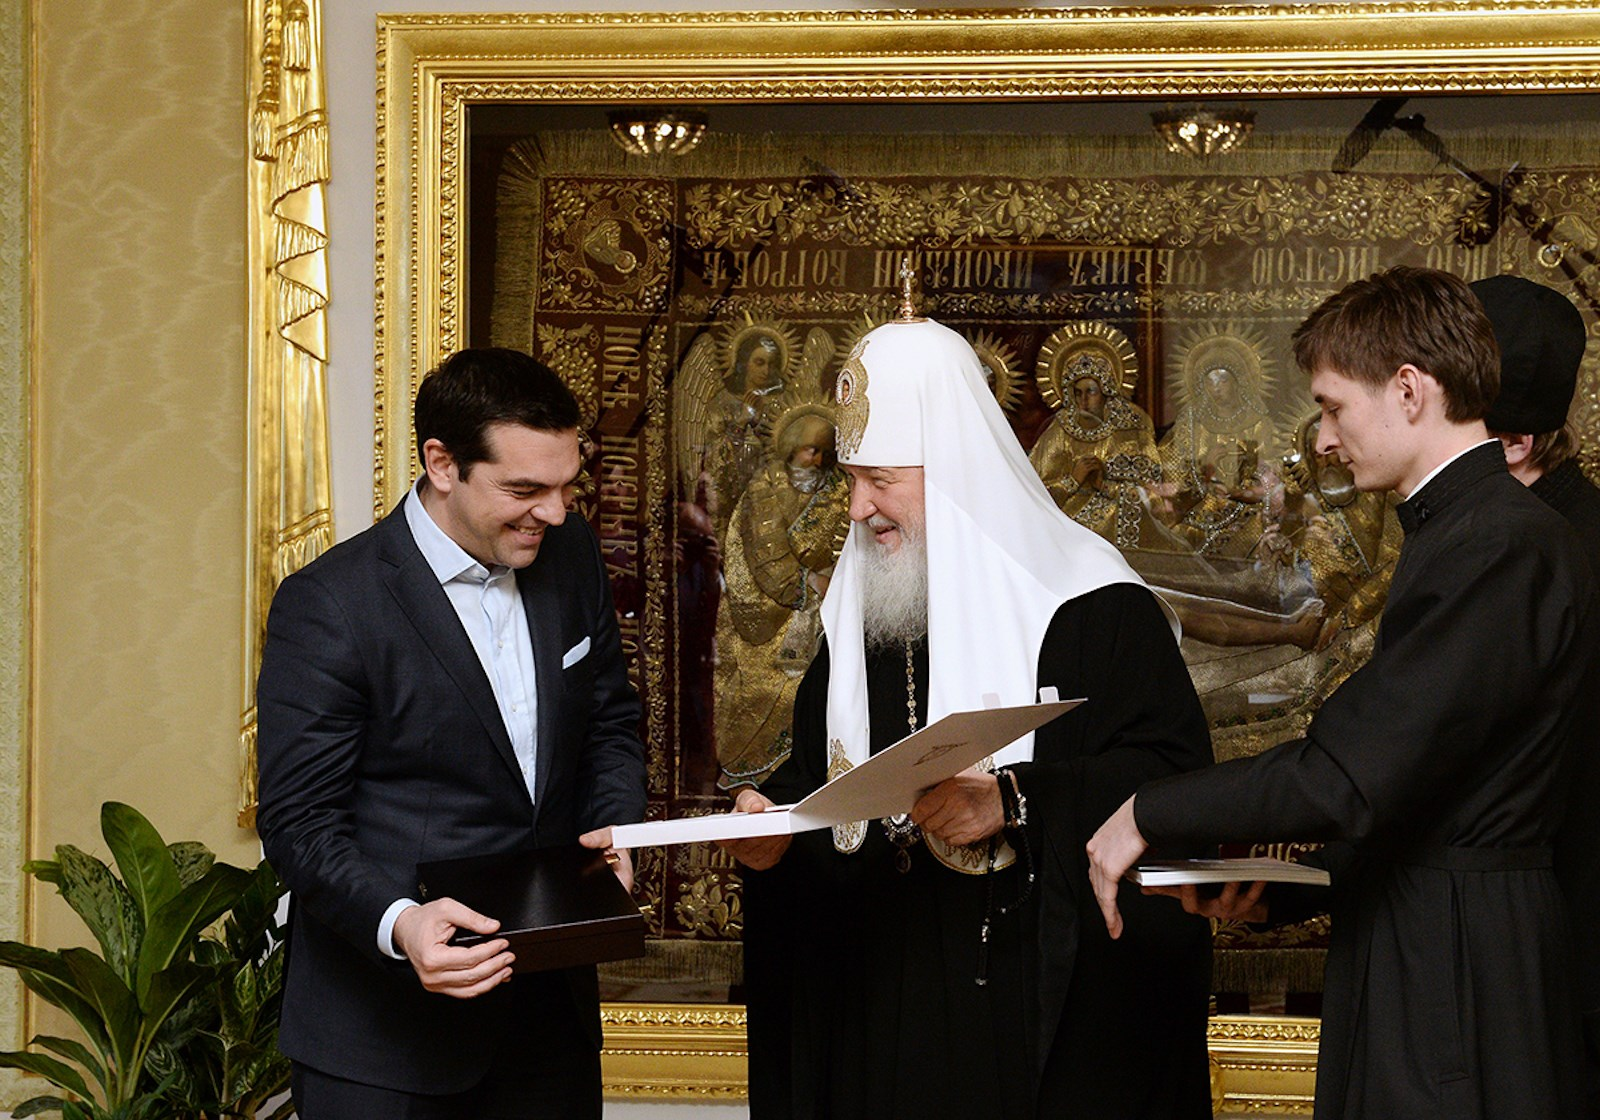 00 Patriarch kirill. Alexis Tsipras. moscow 02. 10.04.15